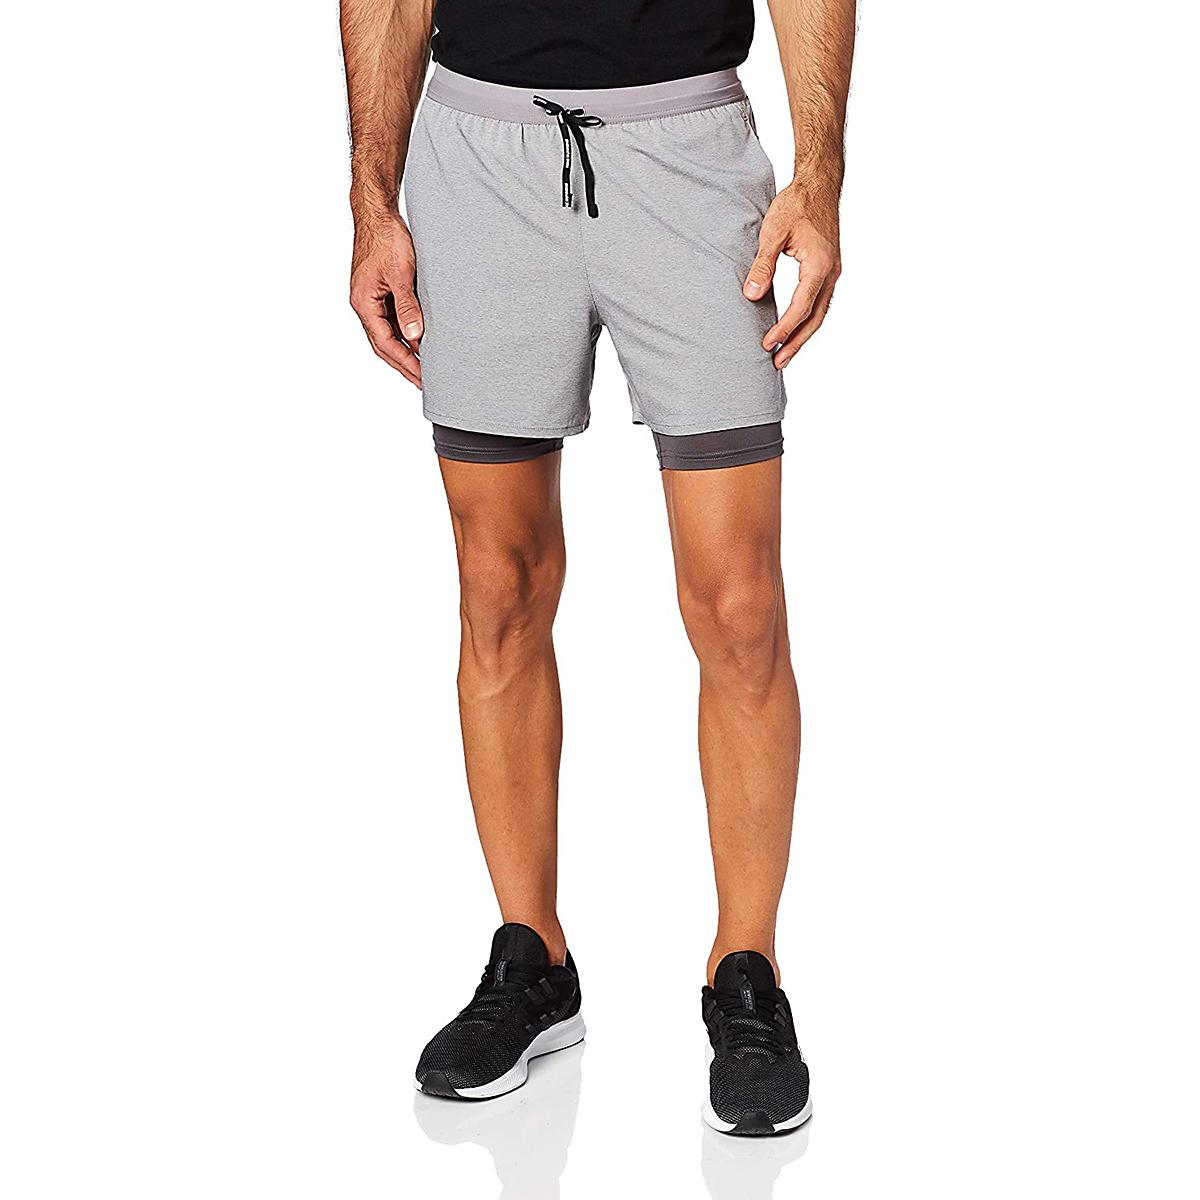 "Men's Nike Dri-FIT Flex Stride 7"" 2-in-1 Shorts - Color: Gunsmoke/Heather/Thunder Grey/Metallic Silver - Size: S, Gunsmoke/Heather/Thunder Grey/Metallic Silver, large, image 1"